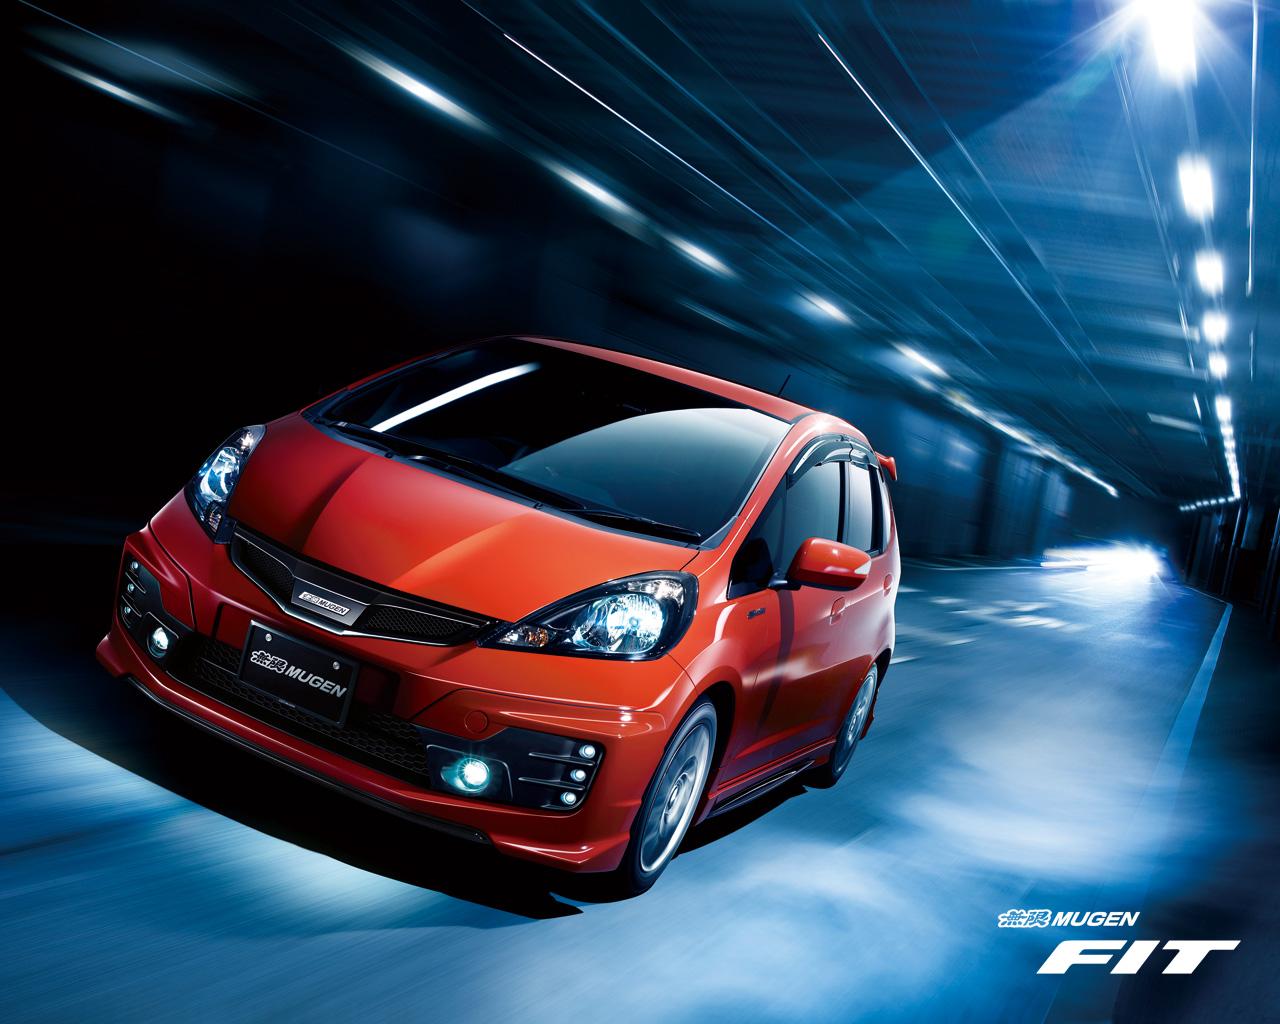 Japanese Tuning cars   Mugen Fit   Honda wallpapers Domo 1280x1024